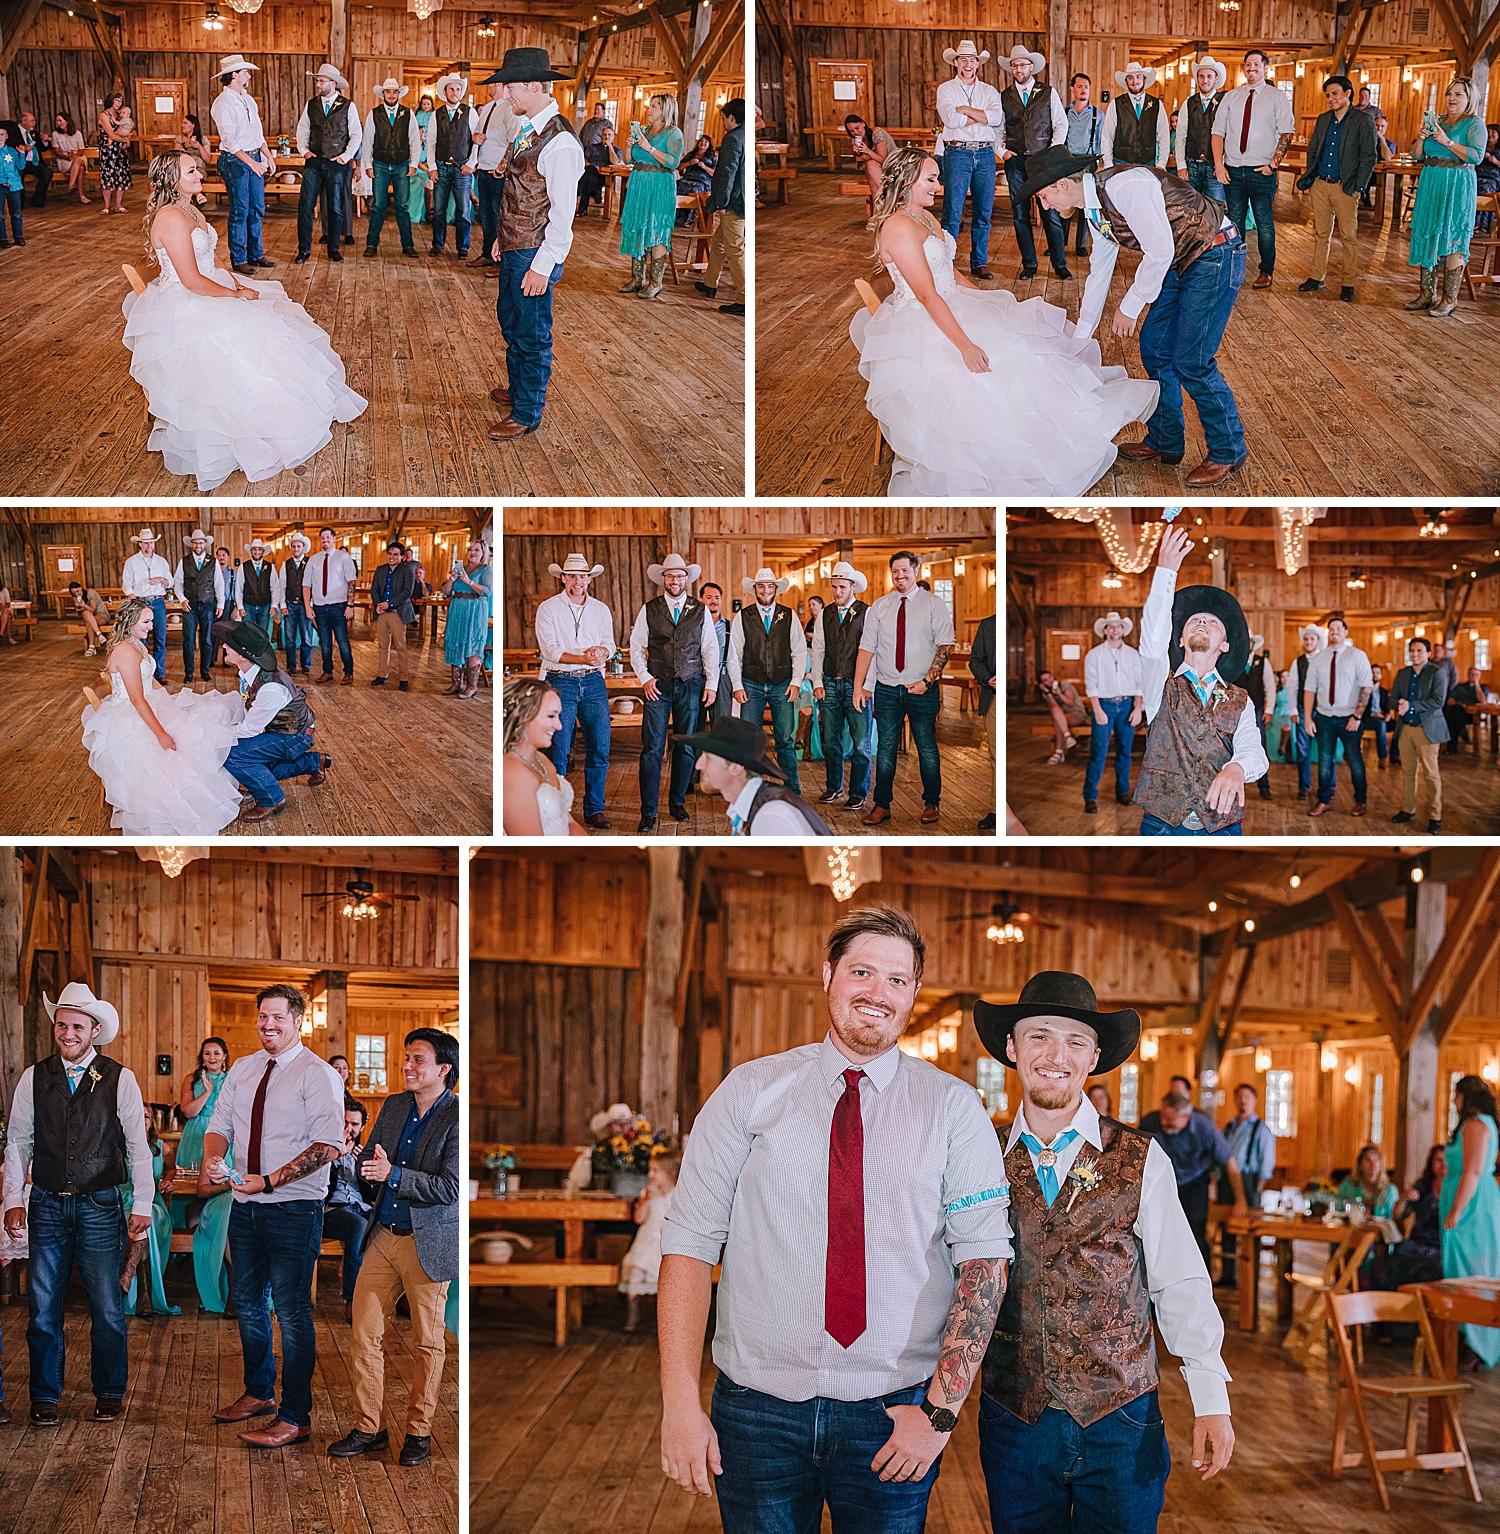 Carly-Barton-Photography-Old-Town-Texas-Rustic-Wedding-Photos-Sunflowers-Boots-Kyle-Texas_0081.jpg